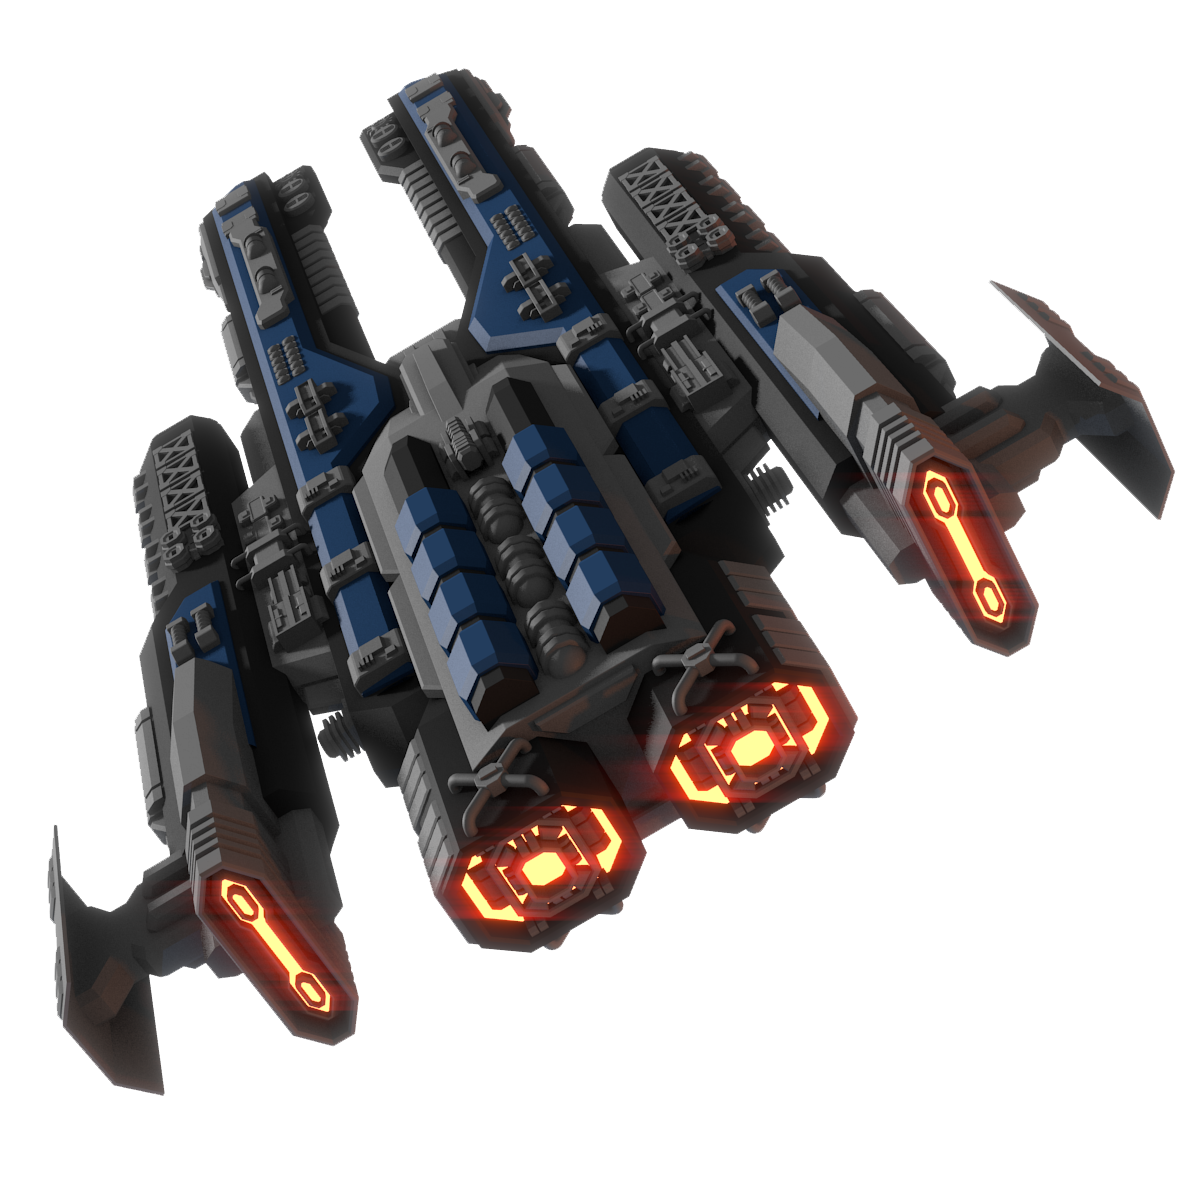 Spaceship PNG Transparent Image